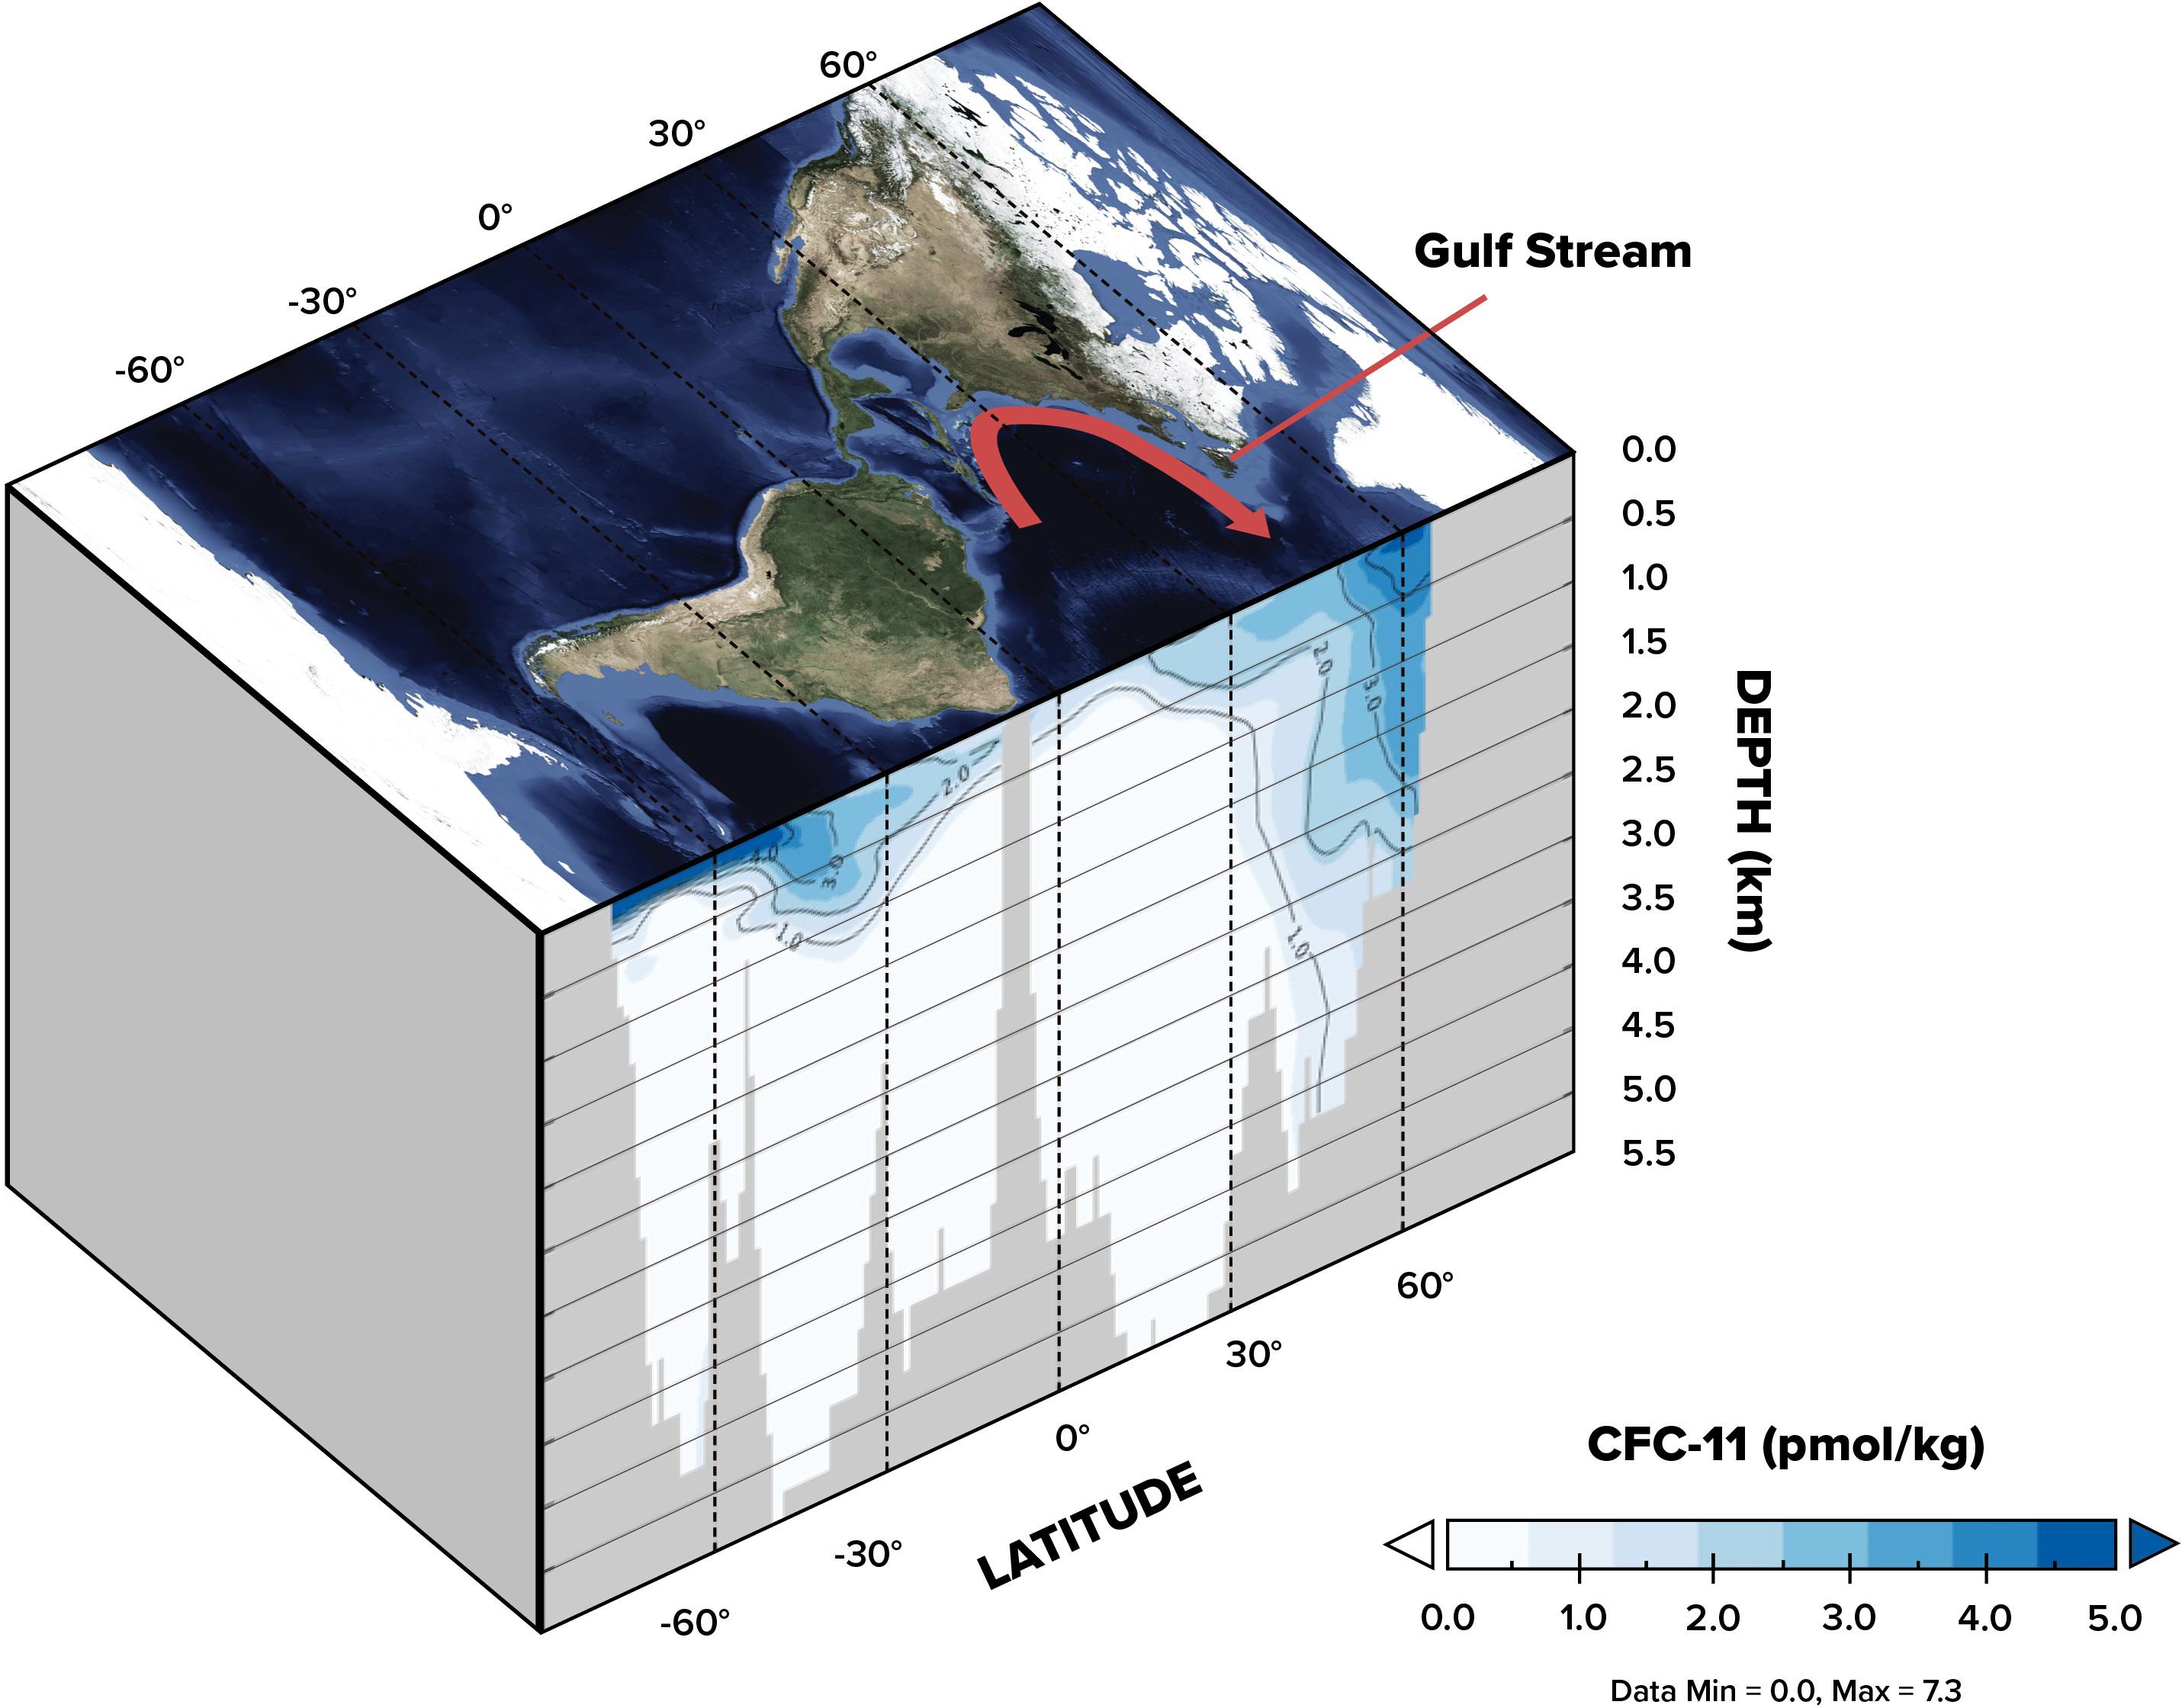 AMOC/Gulf Stream map